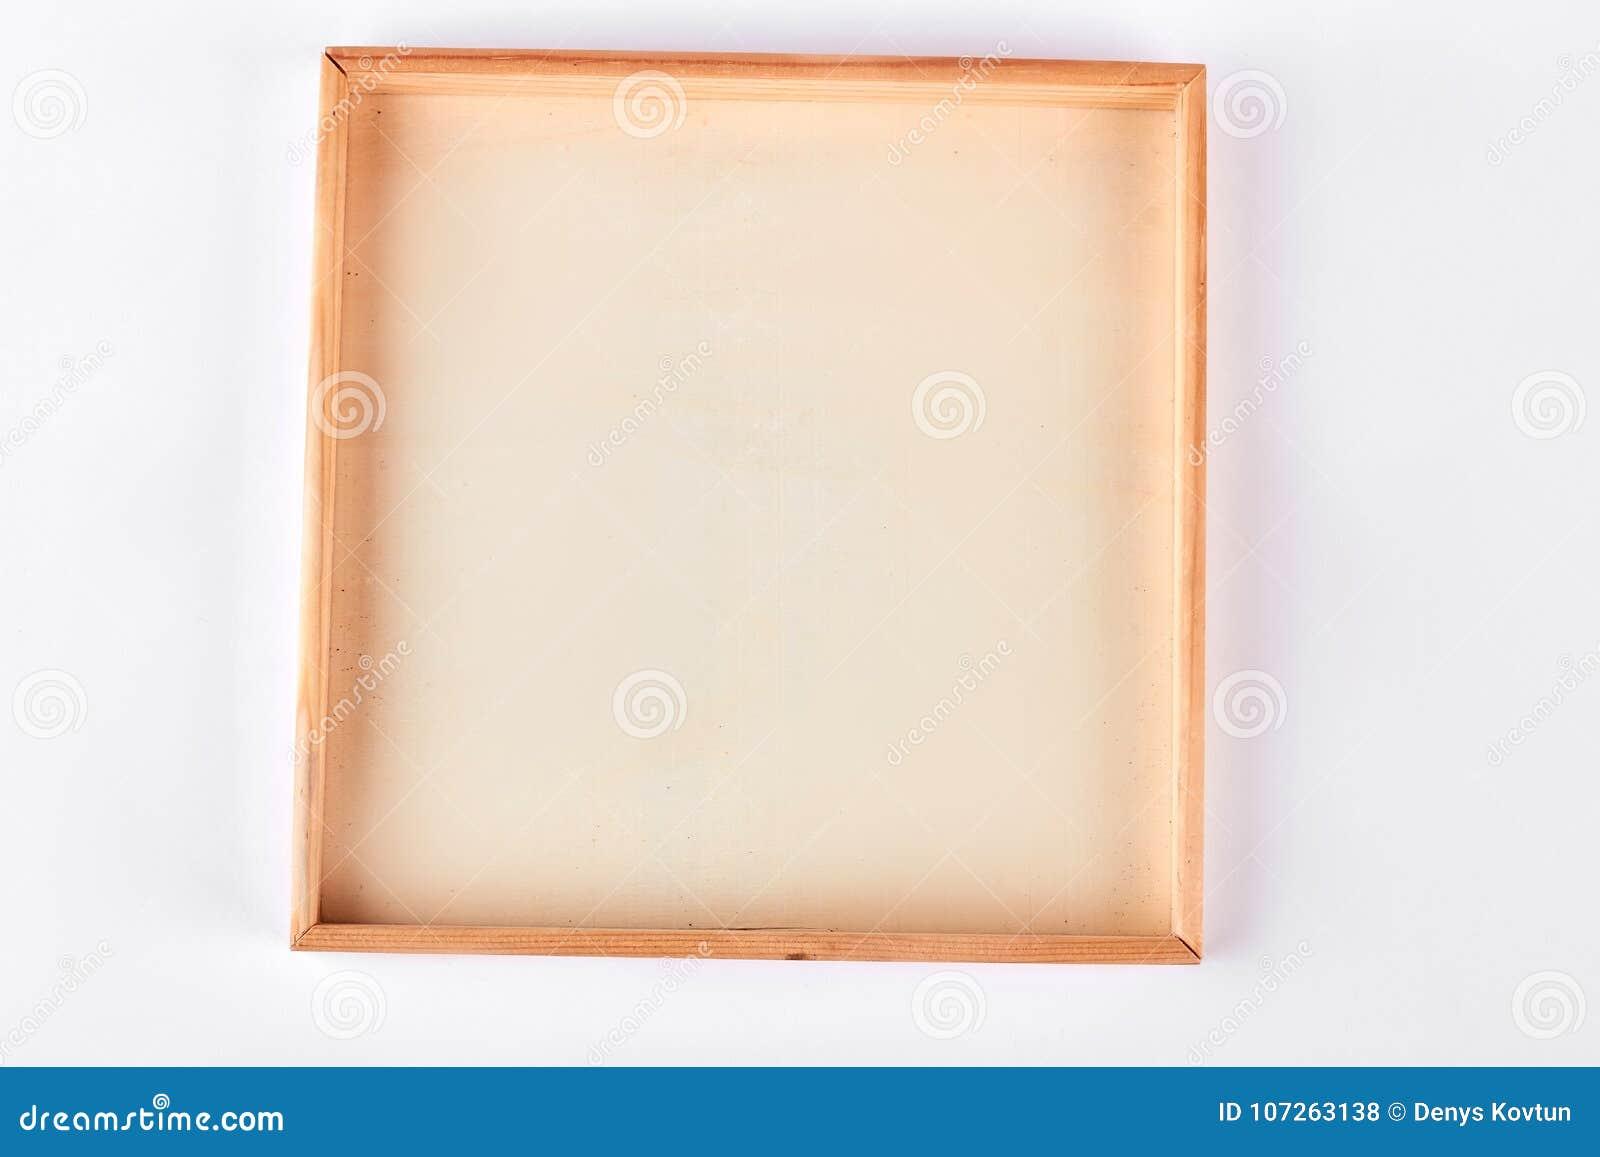 Blank wooden frame white background stock photo image of image blank wooden frame white background jeuxipadfo Gallery